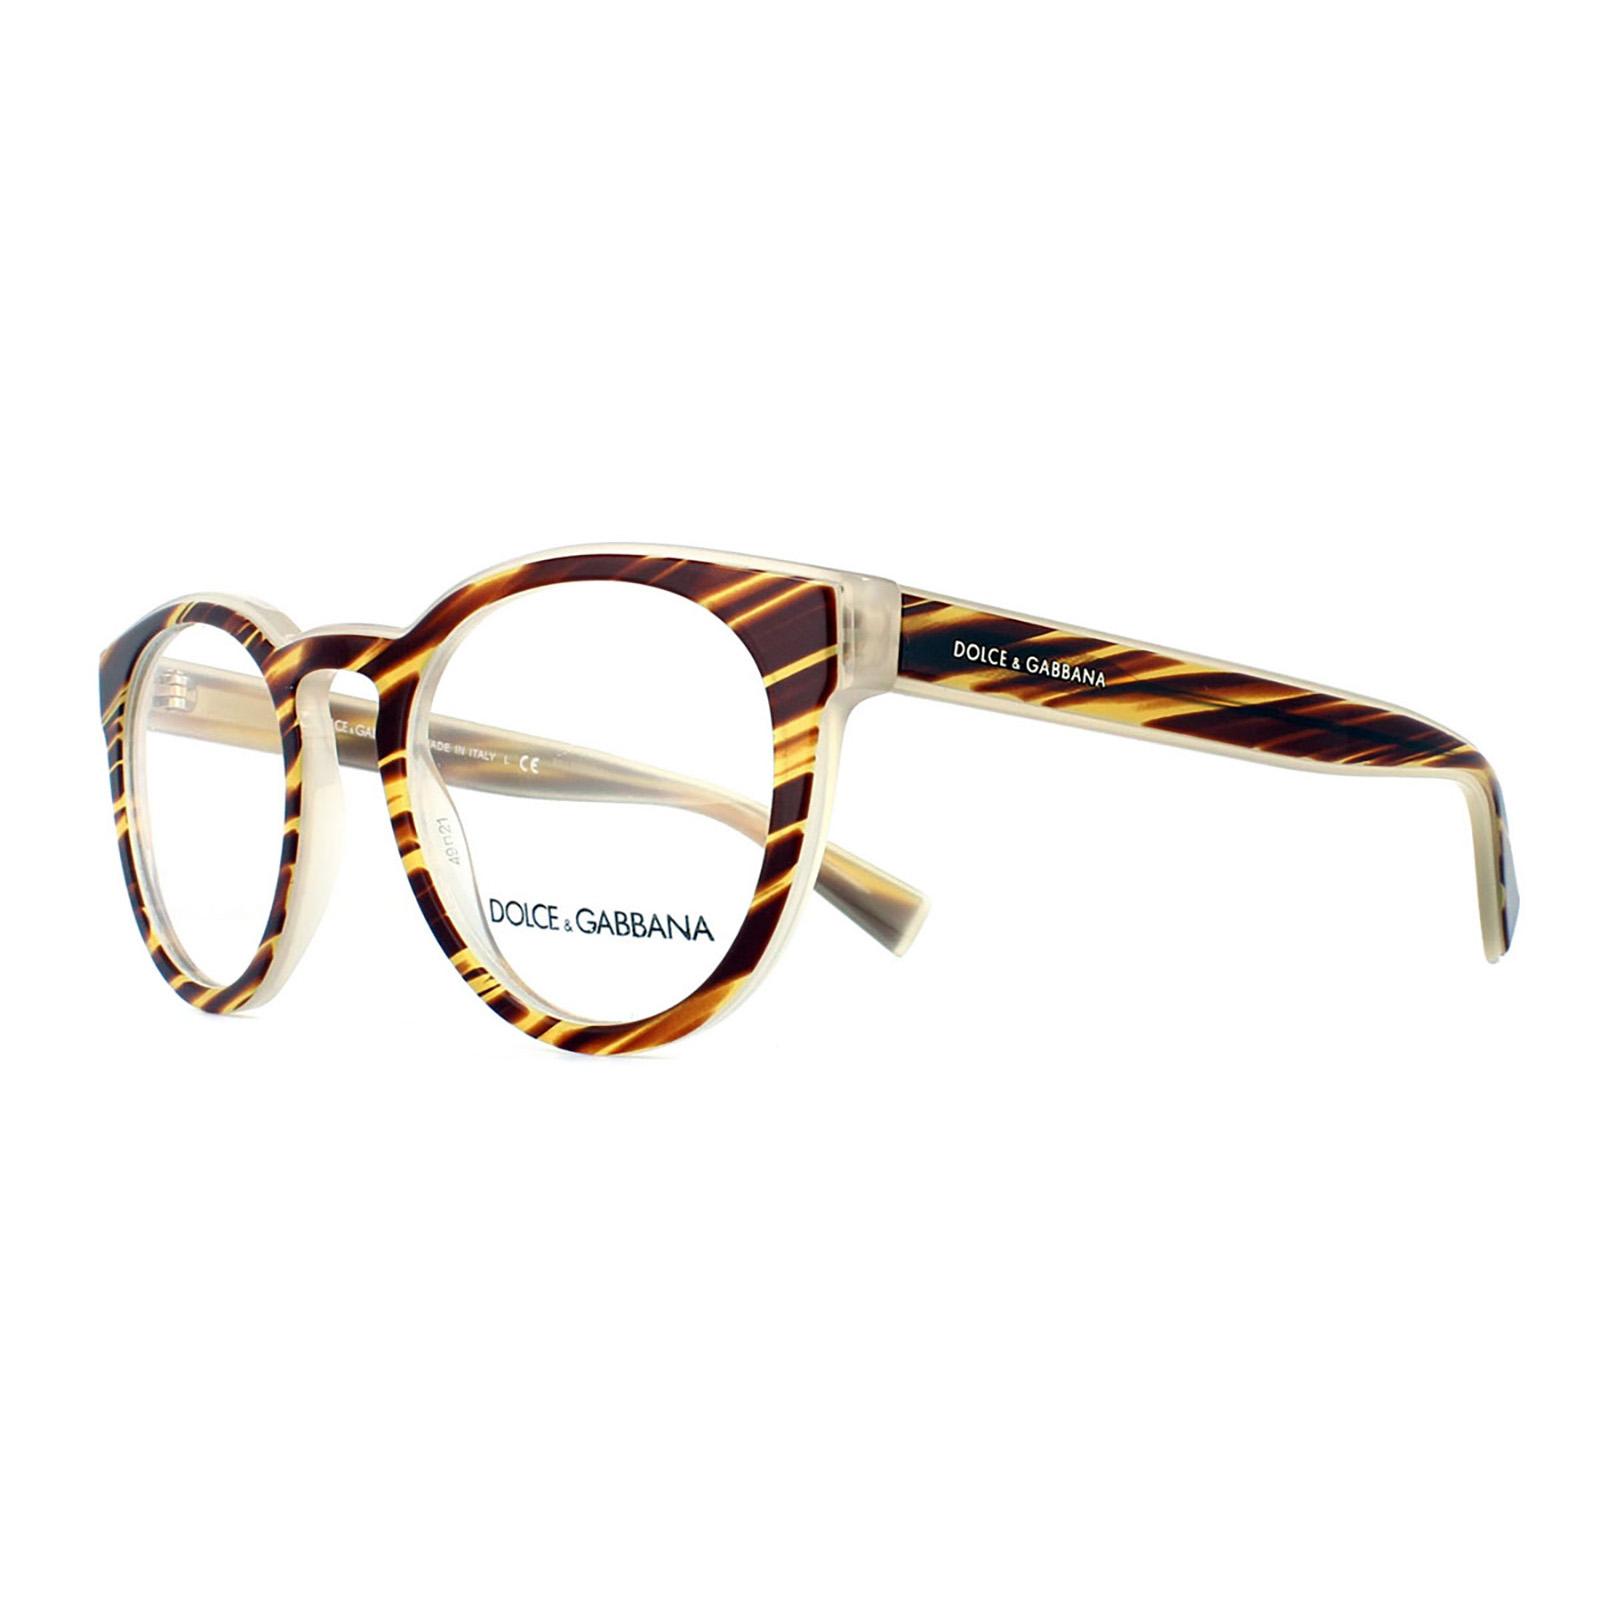 sentinel dolce and gabbana glasses frames 3251 3052 striped honey men 49mm - Dolce And Gabbana Glasses Frames